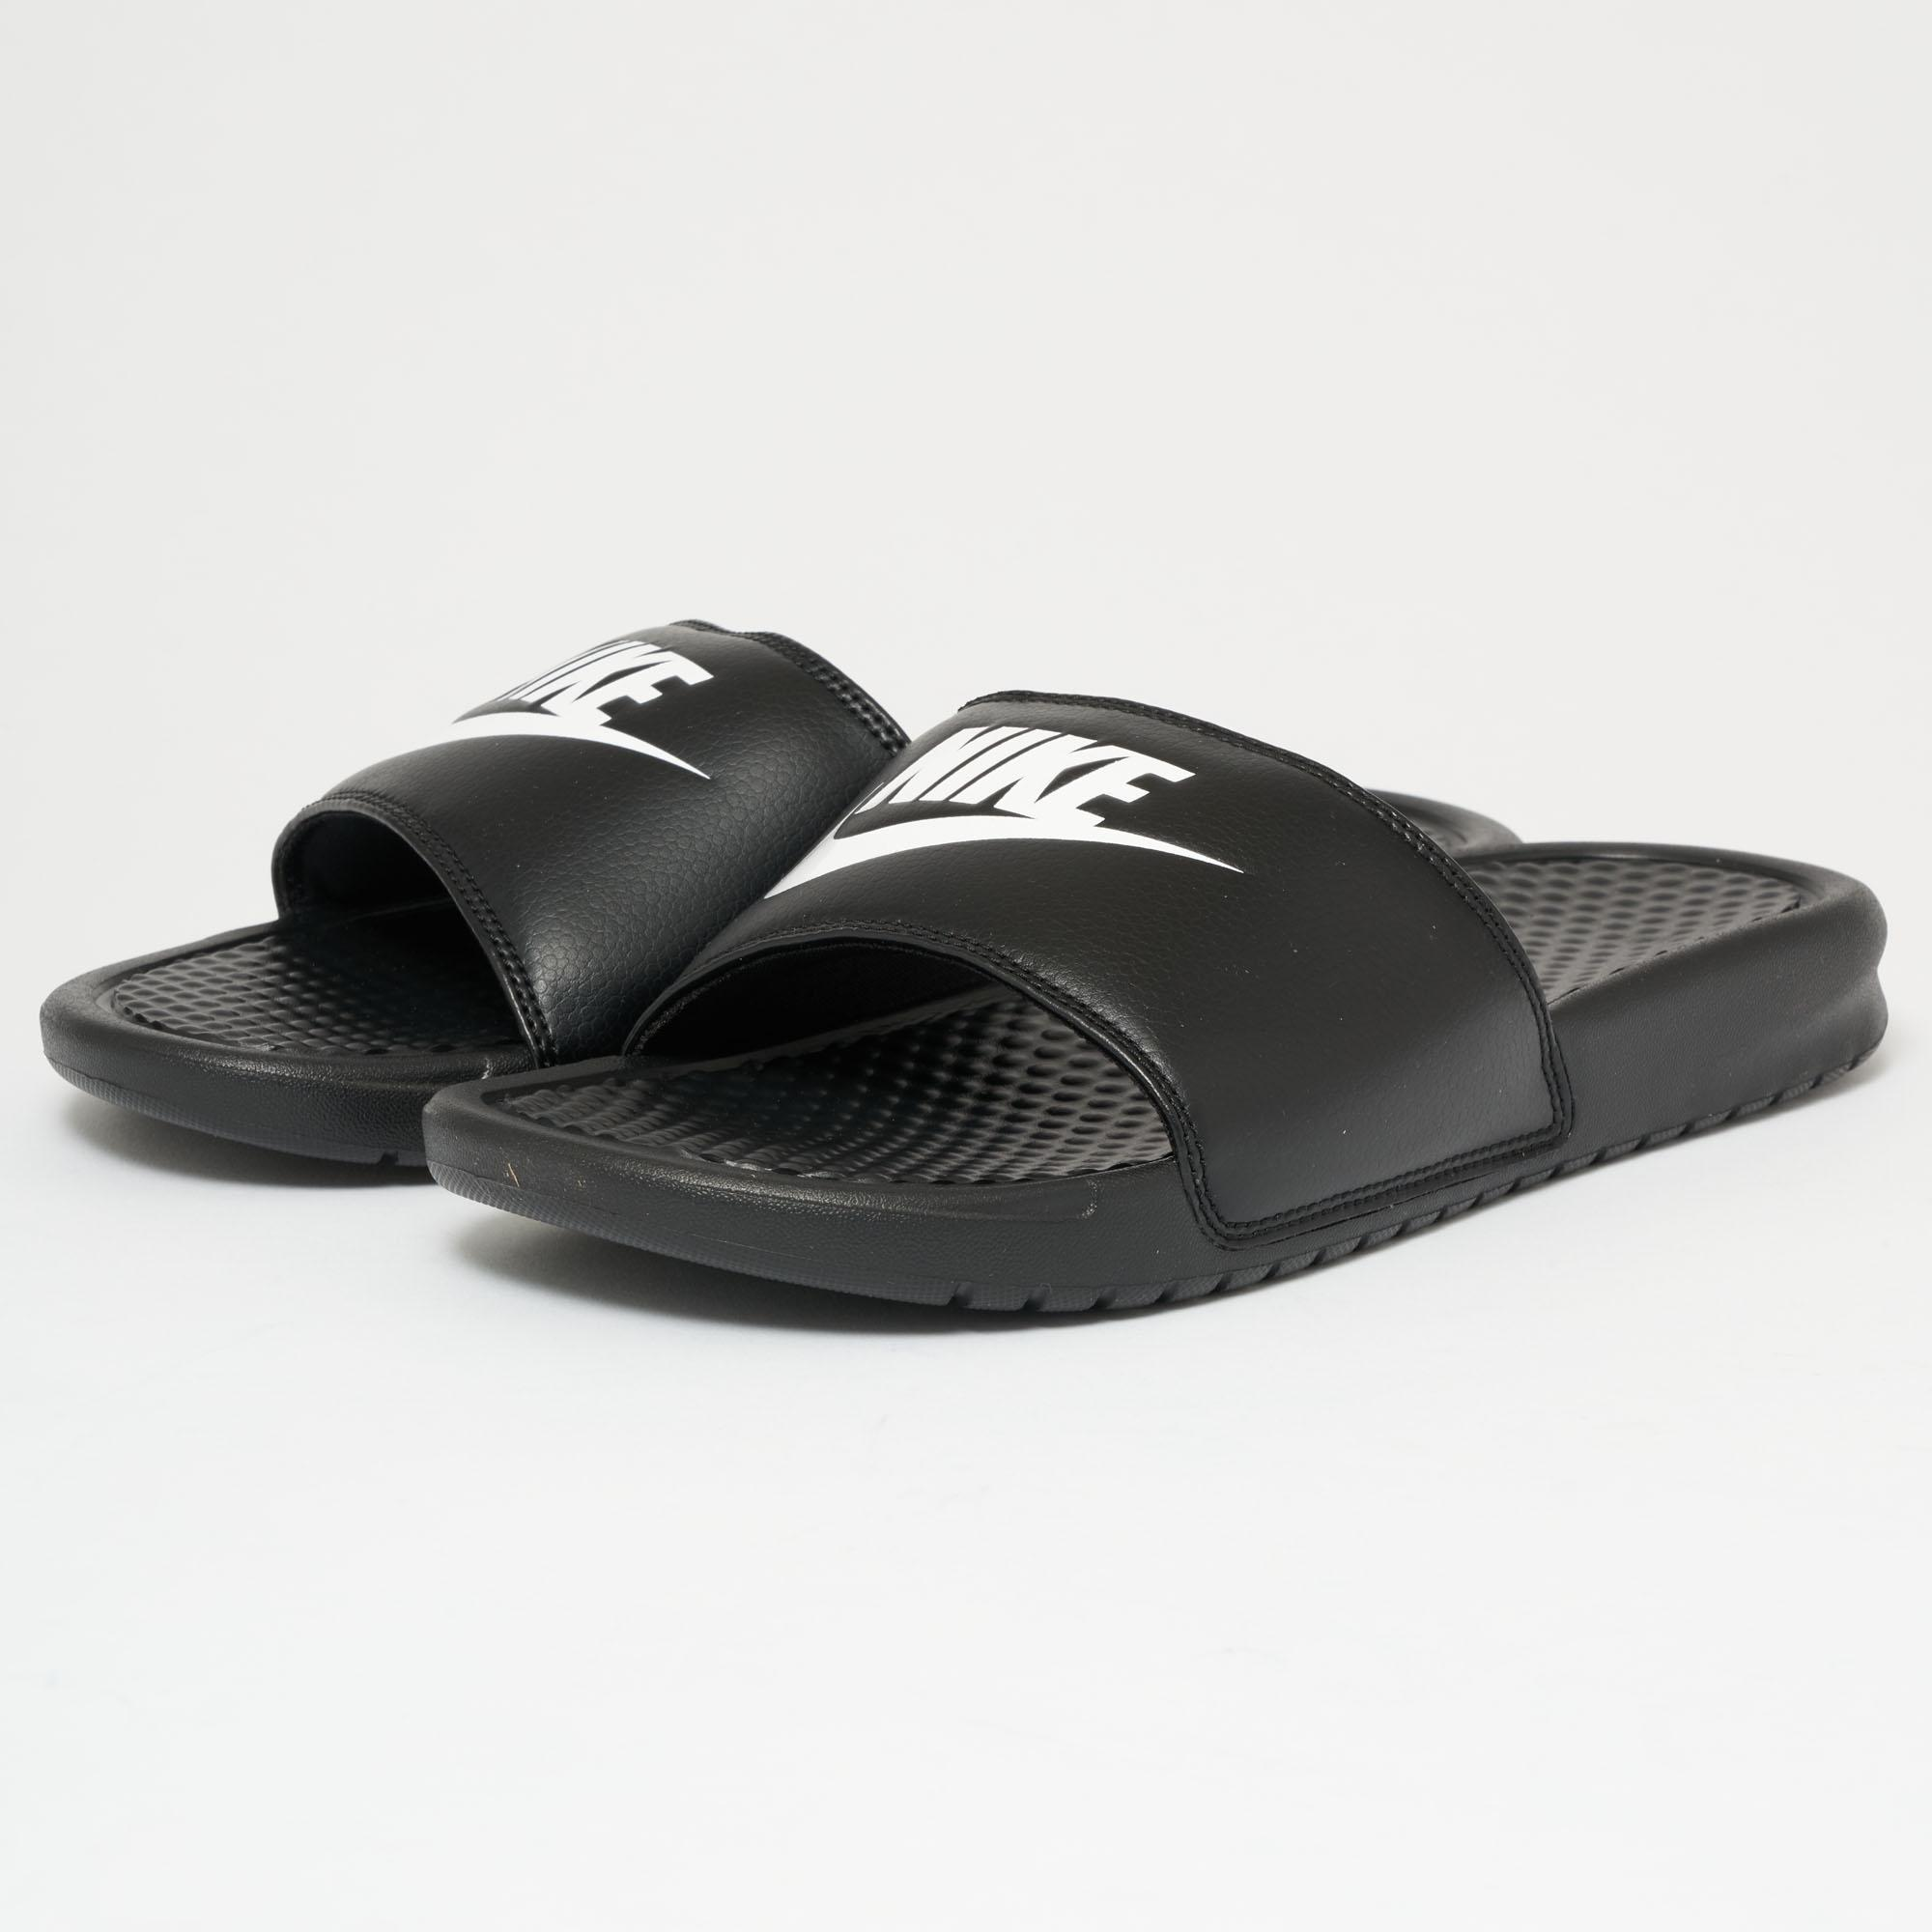 a80cb25255e30 Lyst - Nike Benassi Jdi Slides - Black   White in Black